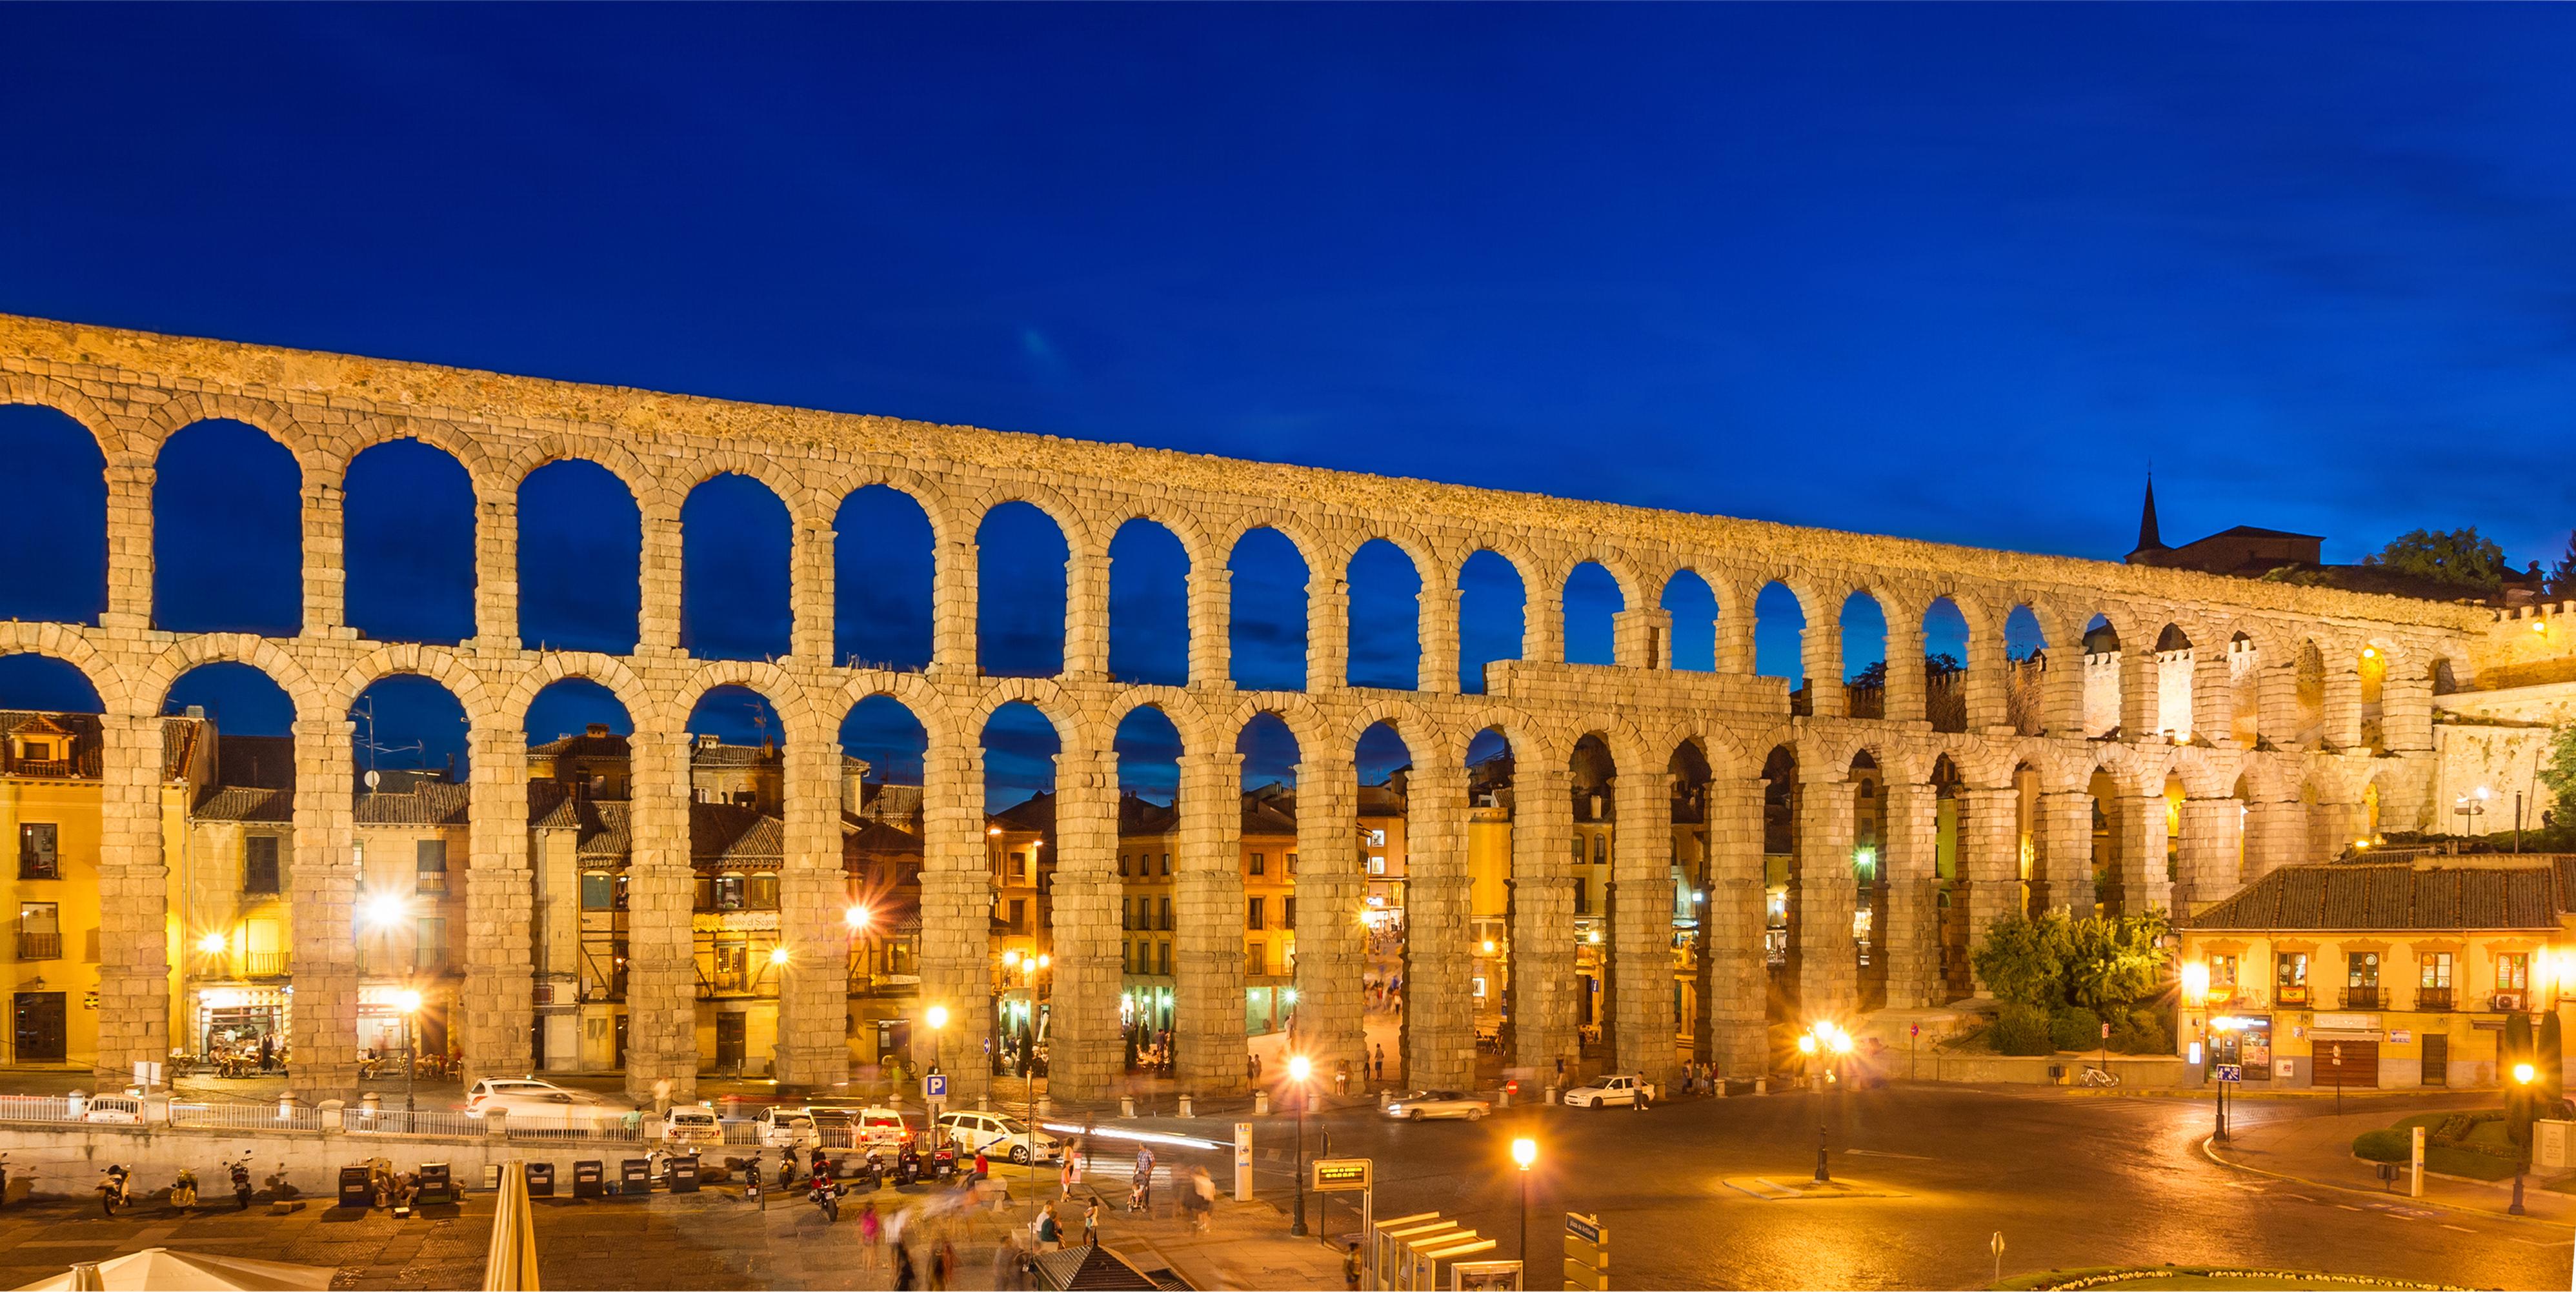 File:Roman Aqueduct Segovia night 2012 Spain.jpg